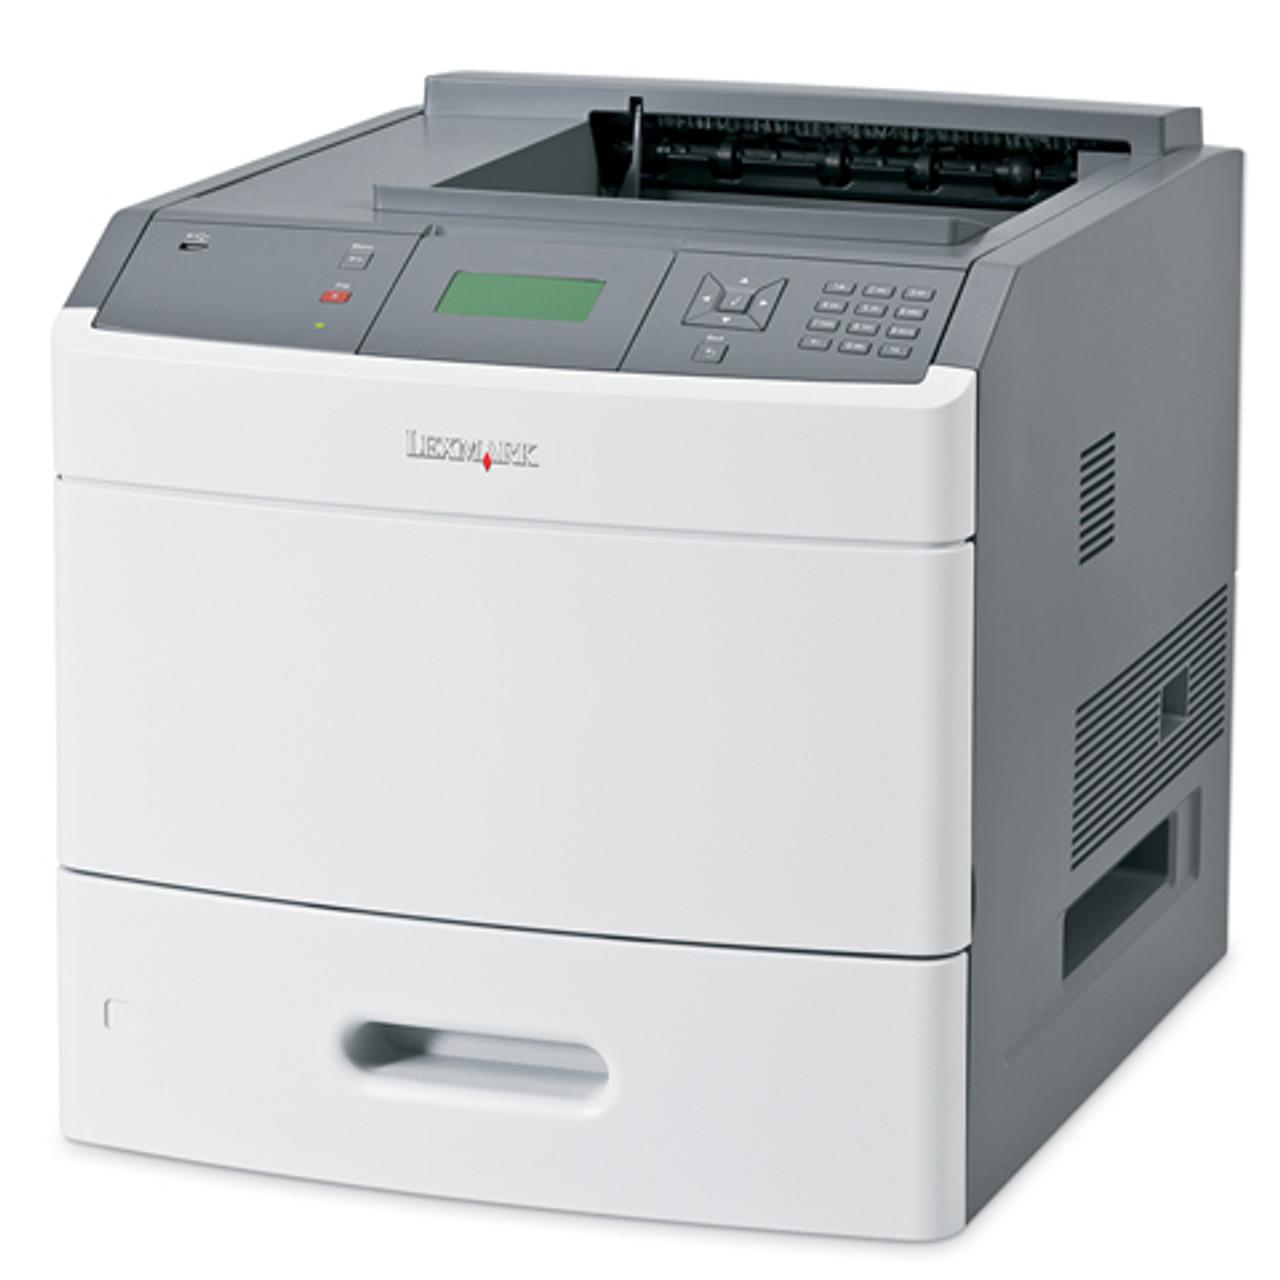 Lexmark T654dn - 30G0300 - Lexmar Laser Printer for sale